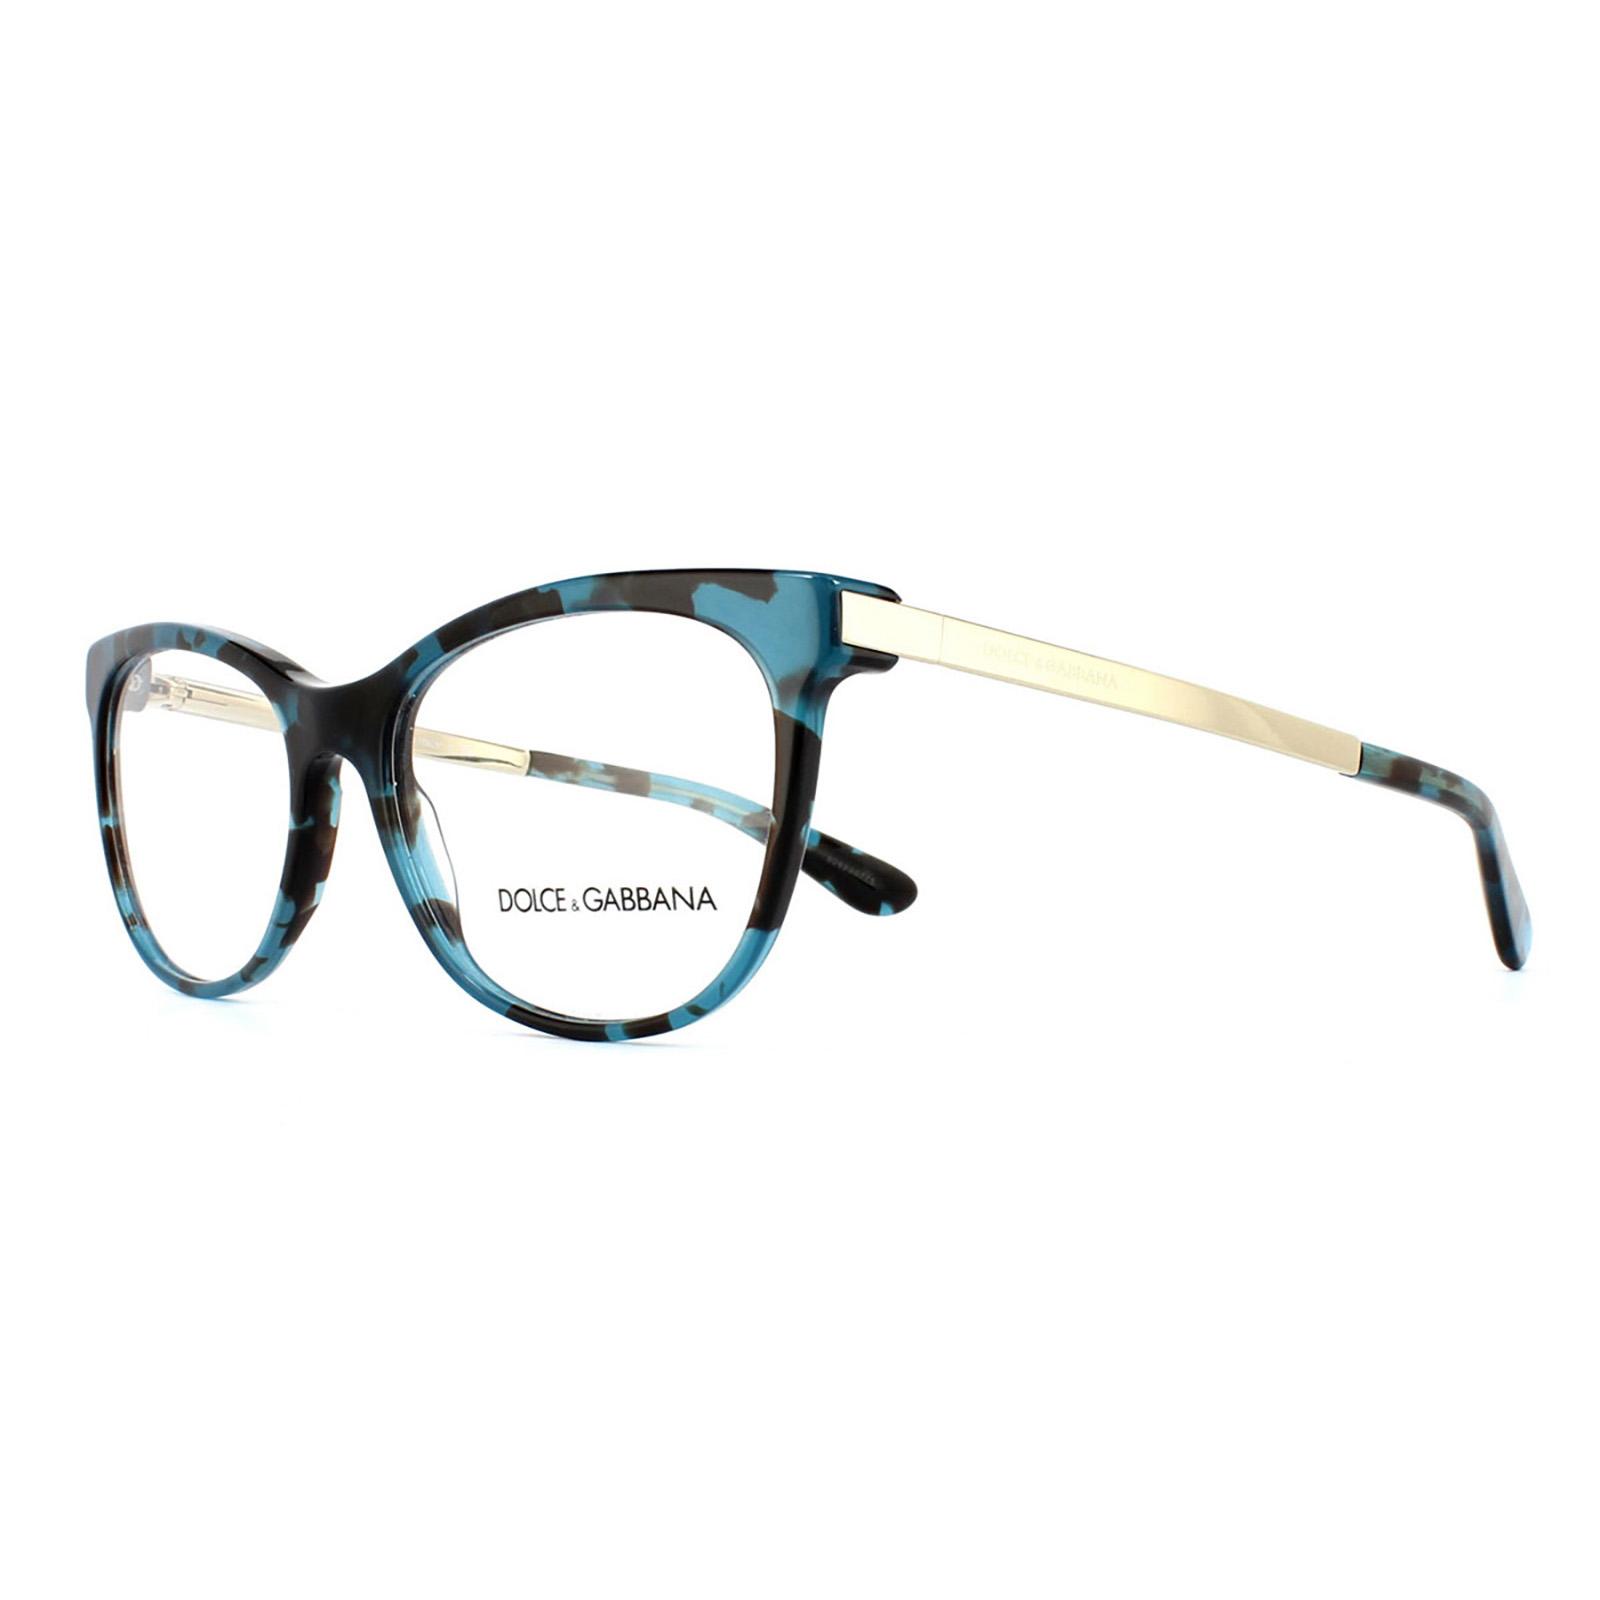 Dolce and Gabbana Glasses Frames 3234 2887 Petrolemu Cube Womens ...